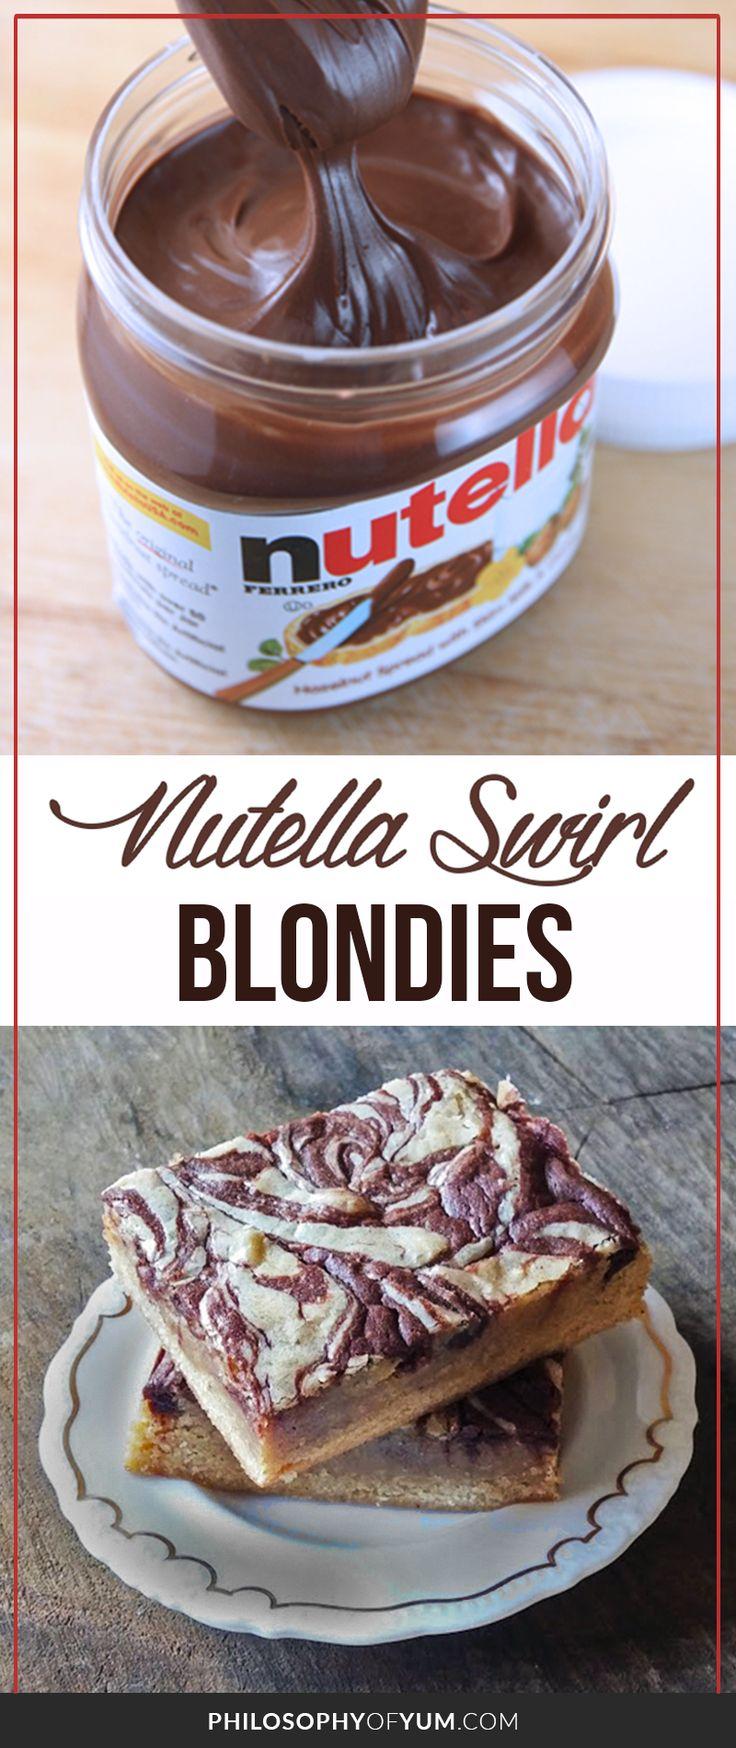 nutella blondies | nutella brownies | nutella recipes